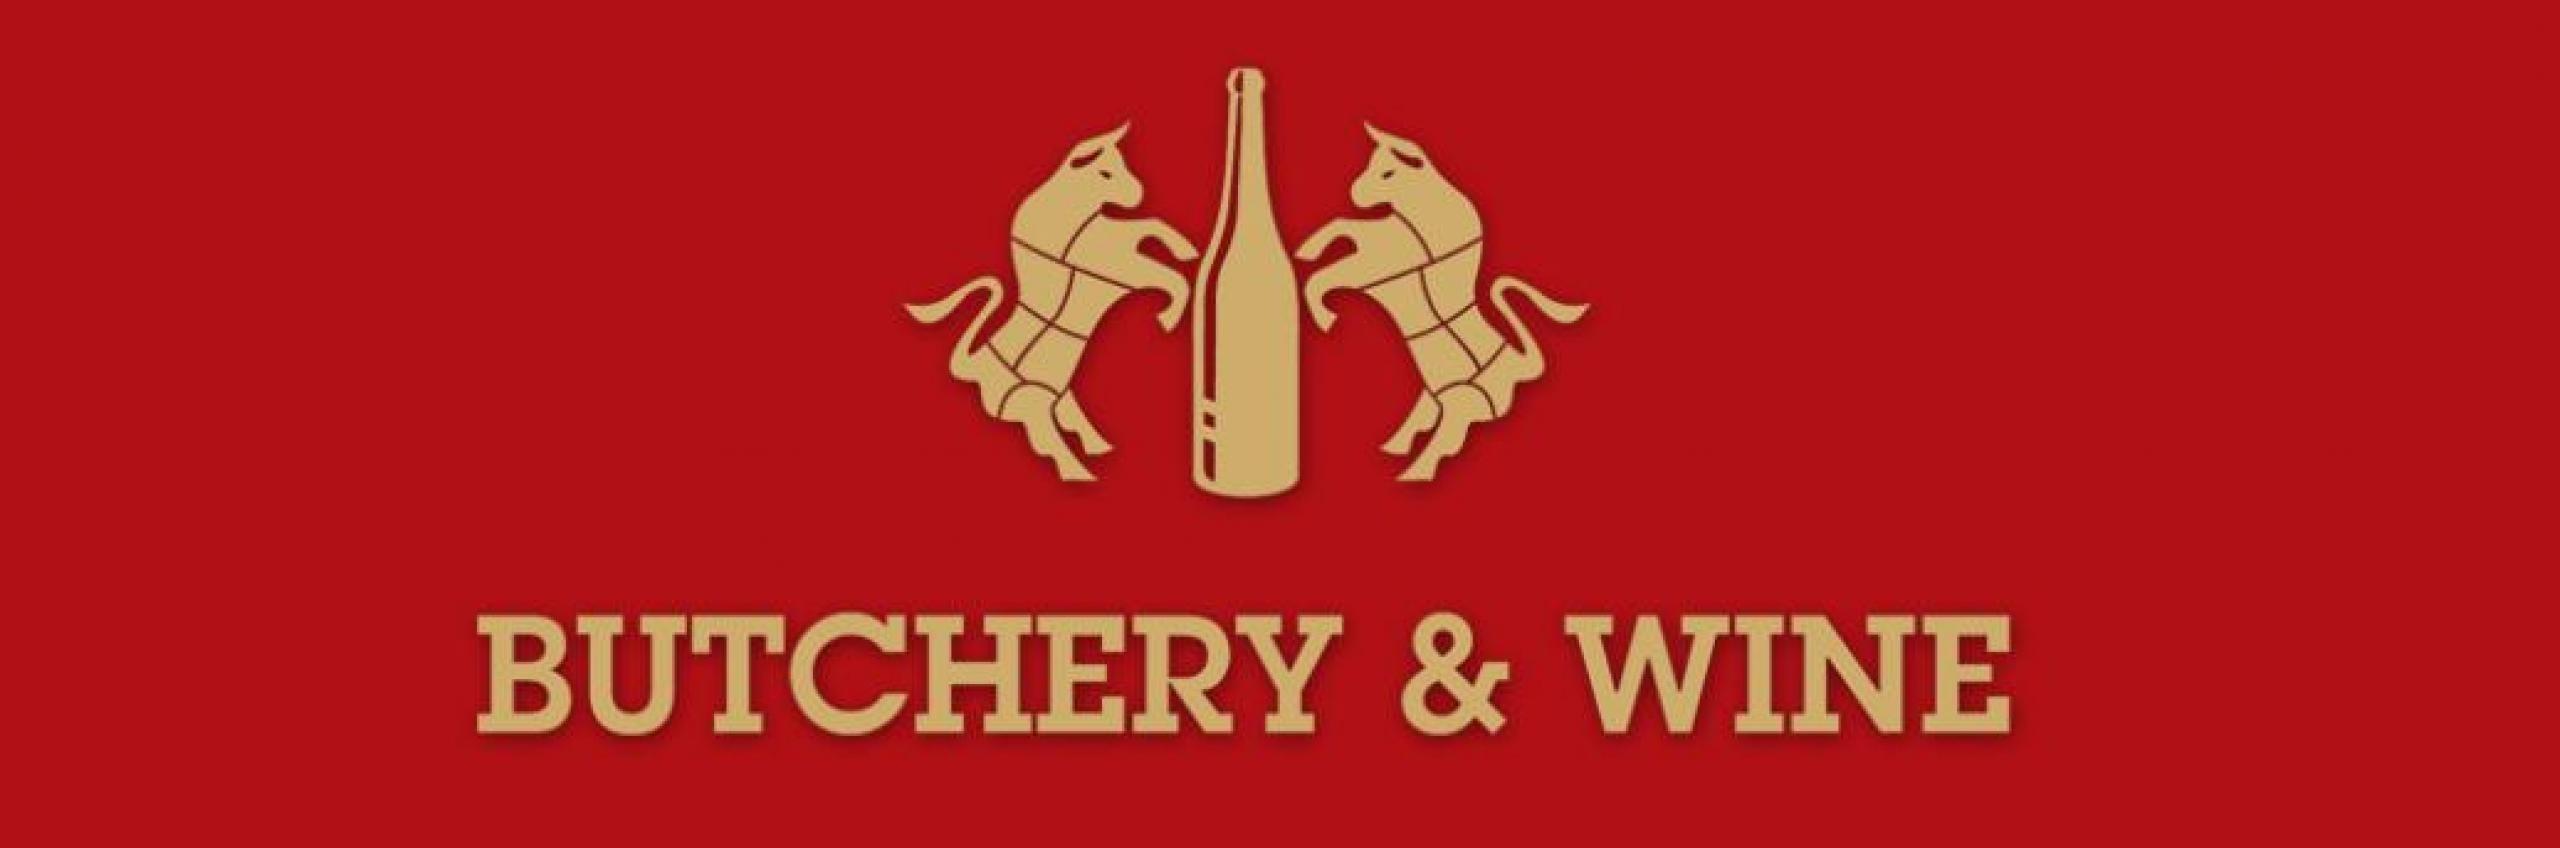 Butchery & Wine Restaurant Hvar